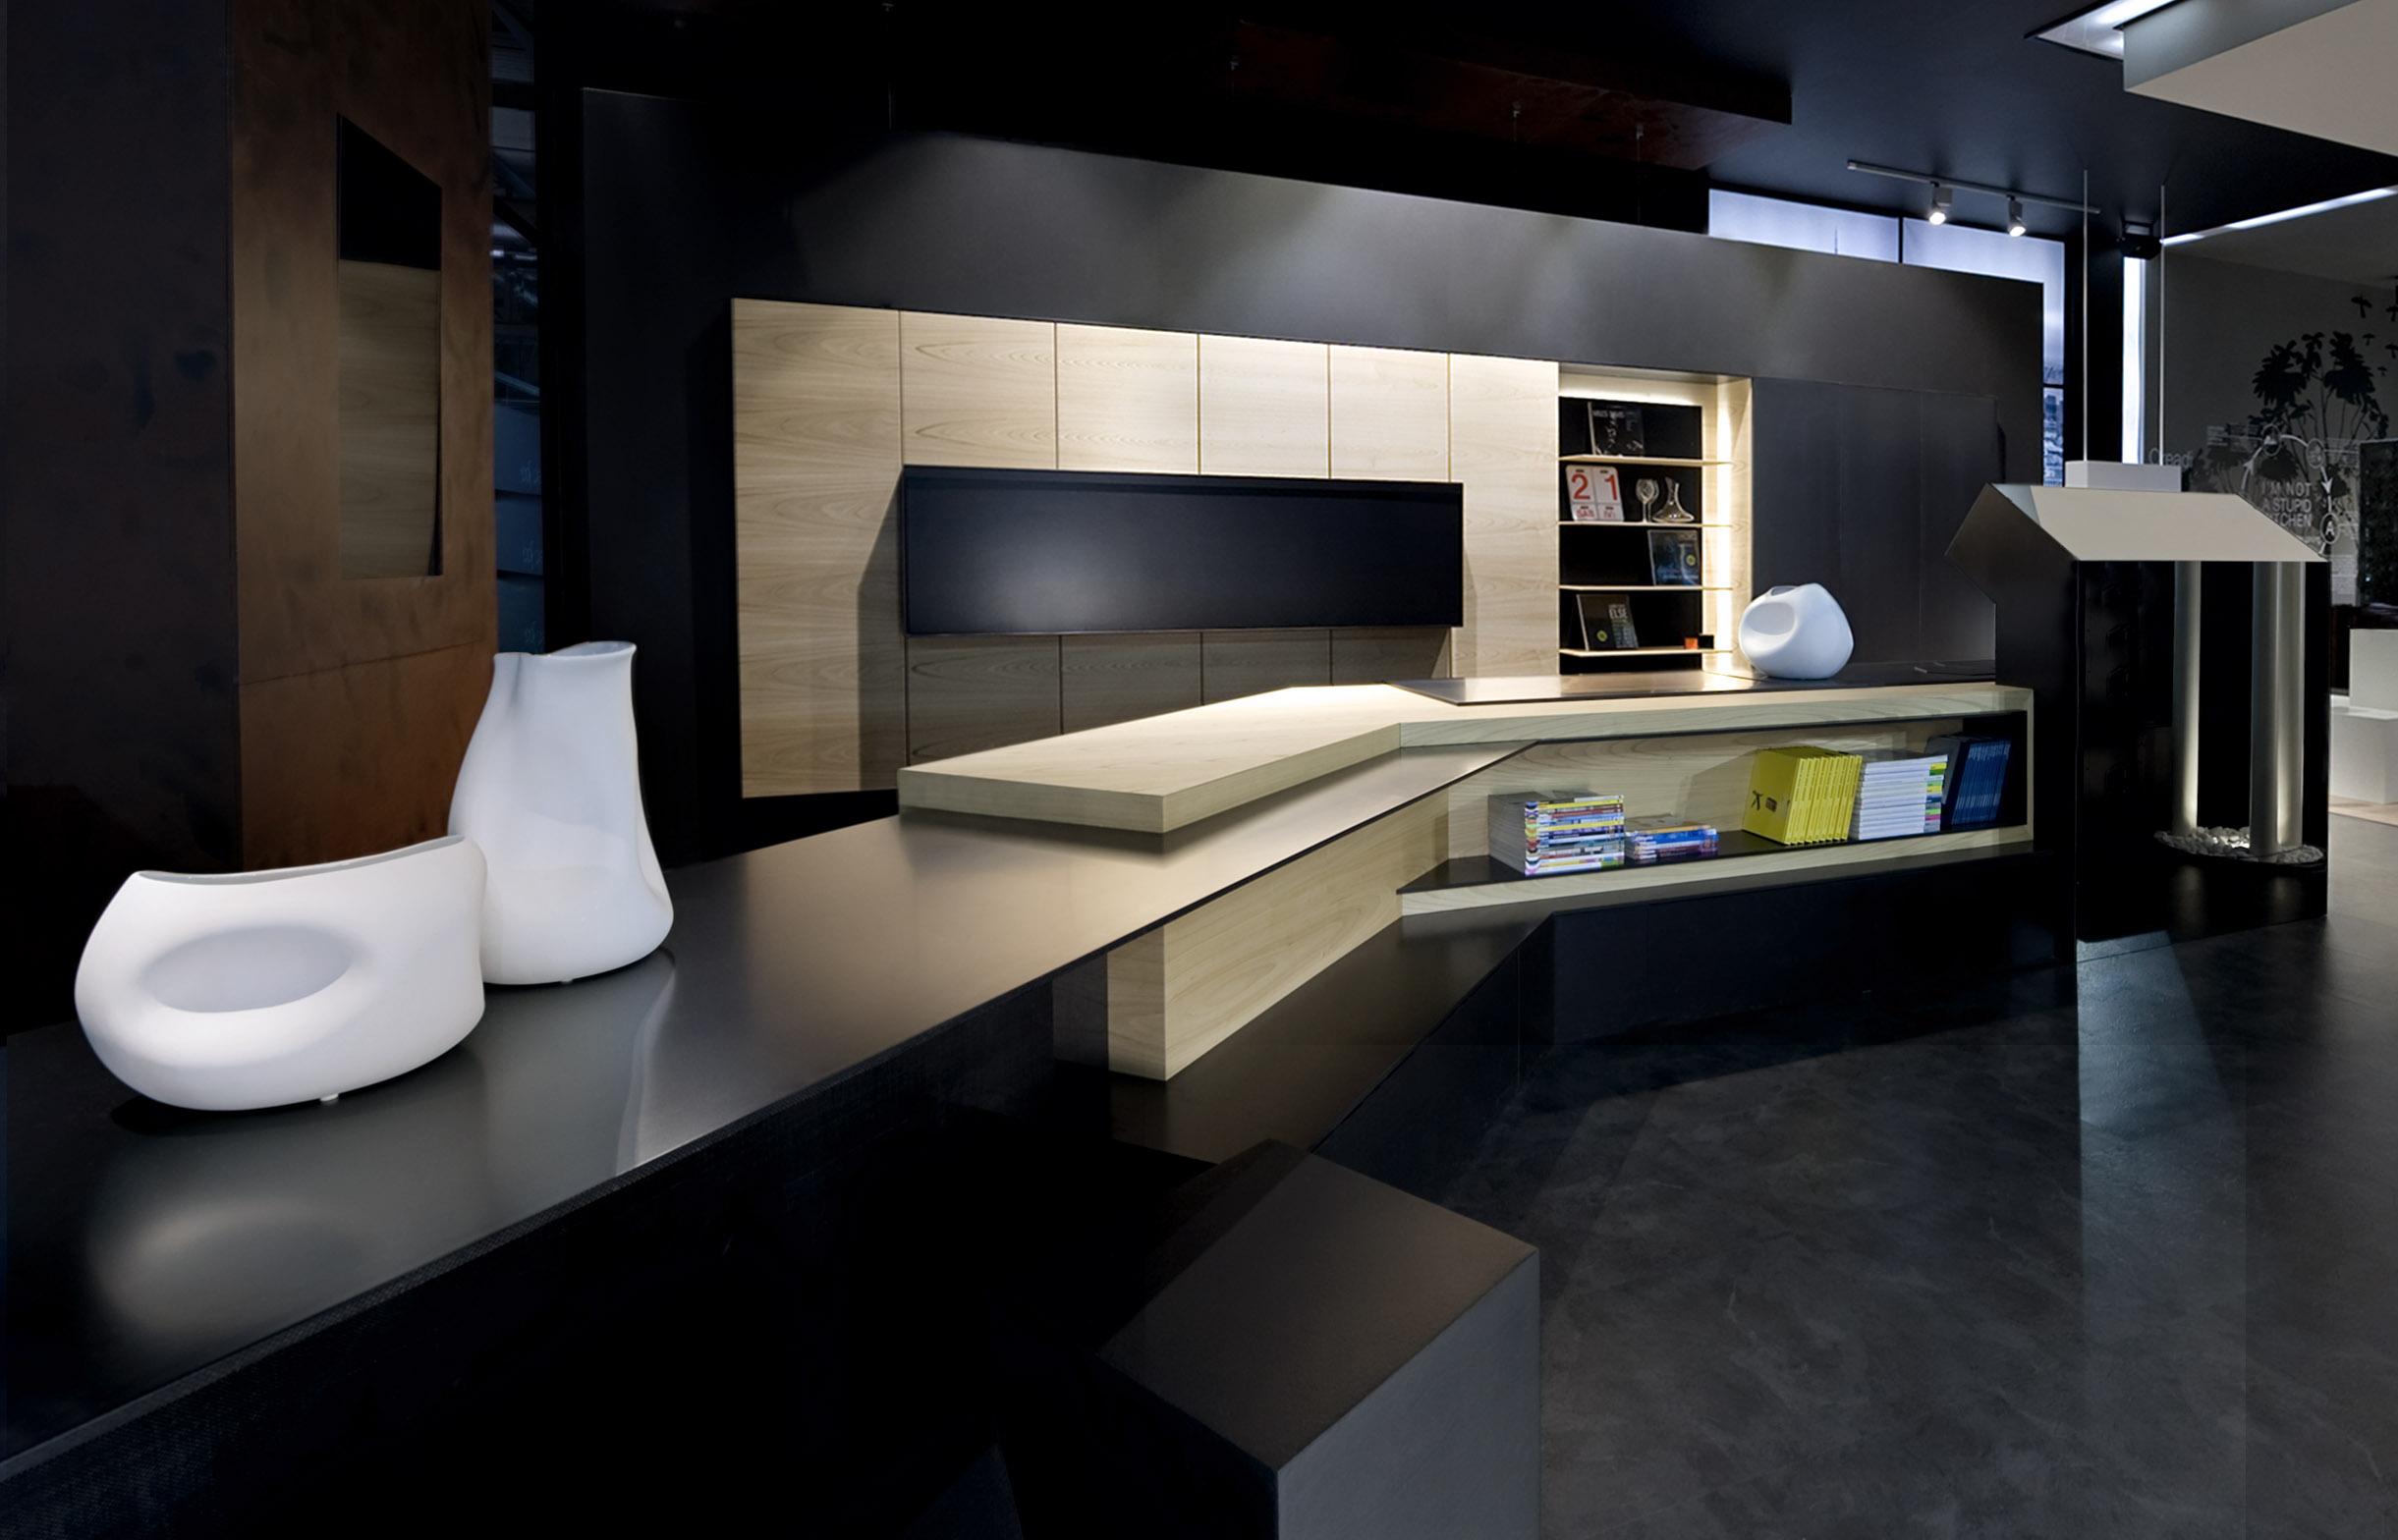 Living design parma nuovo bonus mobili 2016 siete nel target - Bonus mobili iva ...